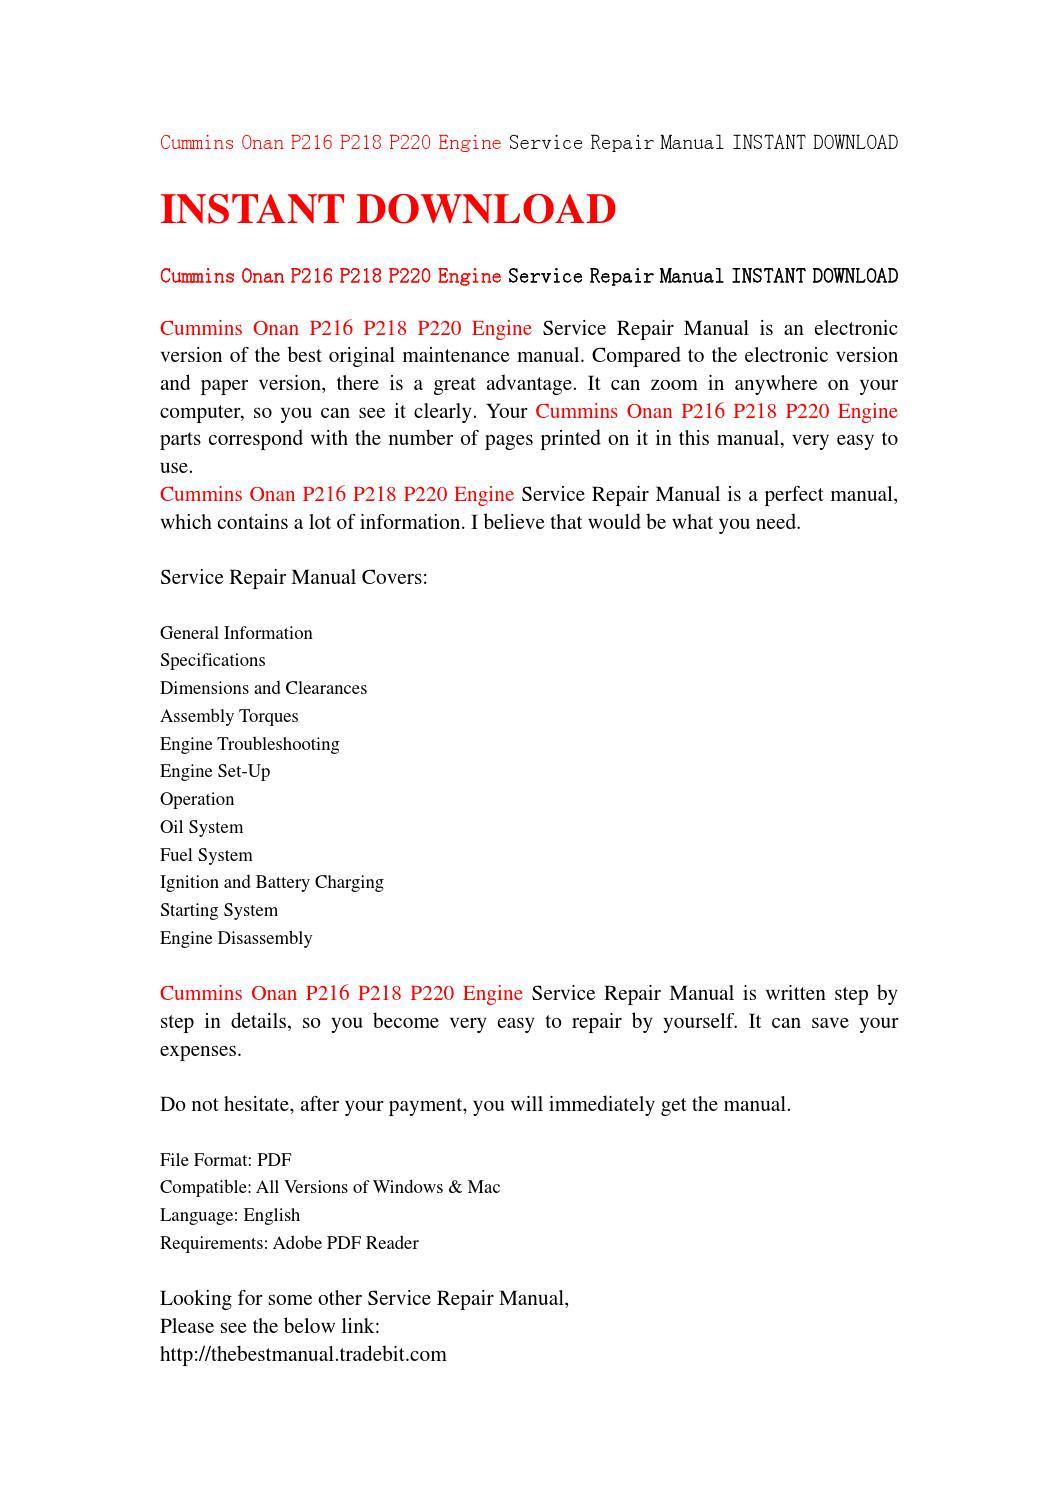 Cummins onan p216 p218 p220 engine service repair manual instant download  by jhsejnn - issuu